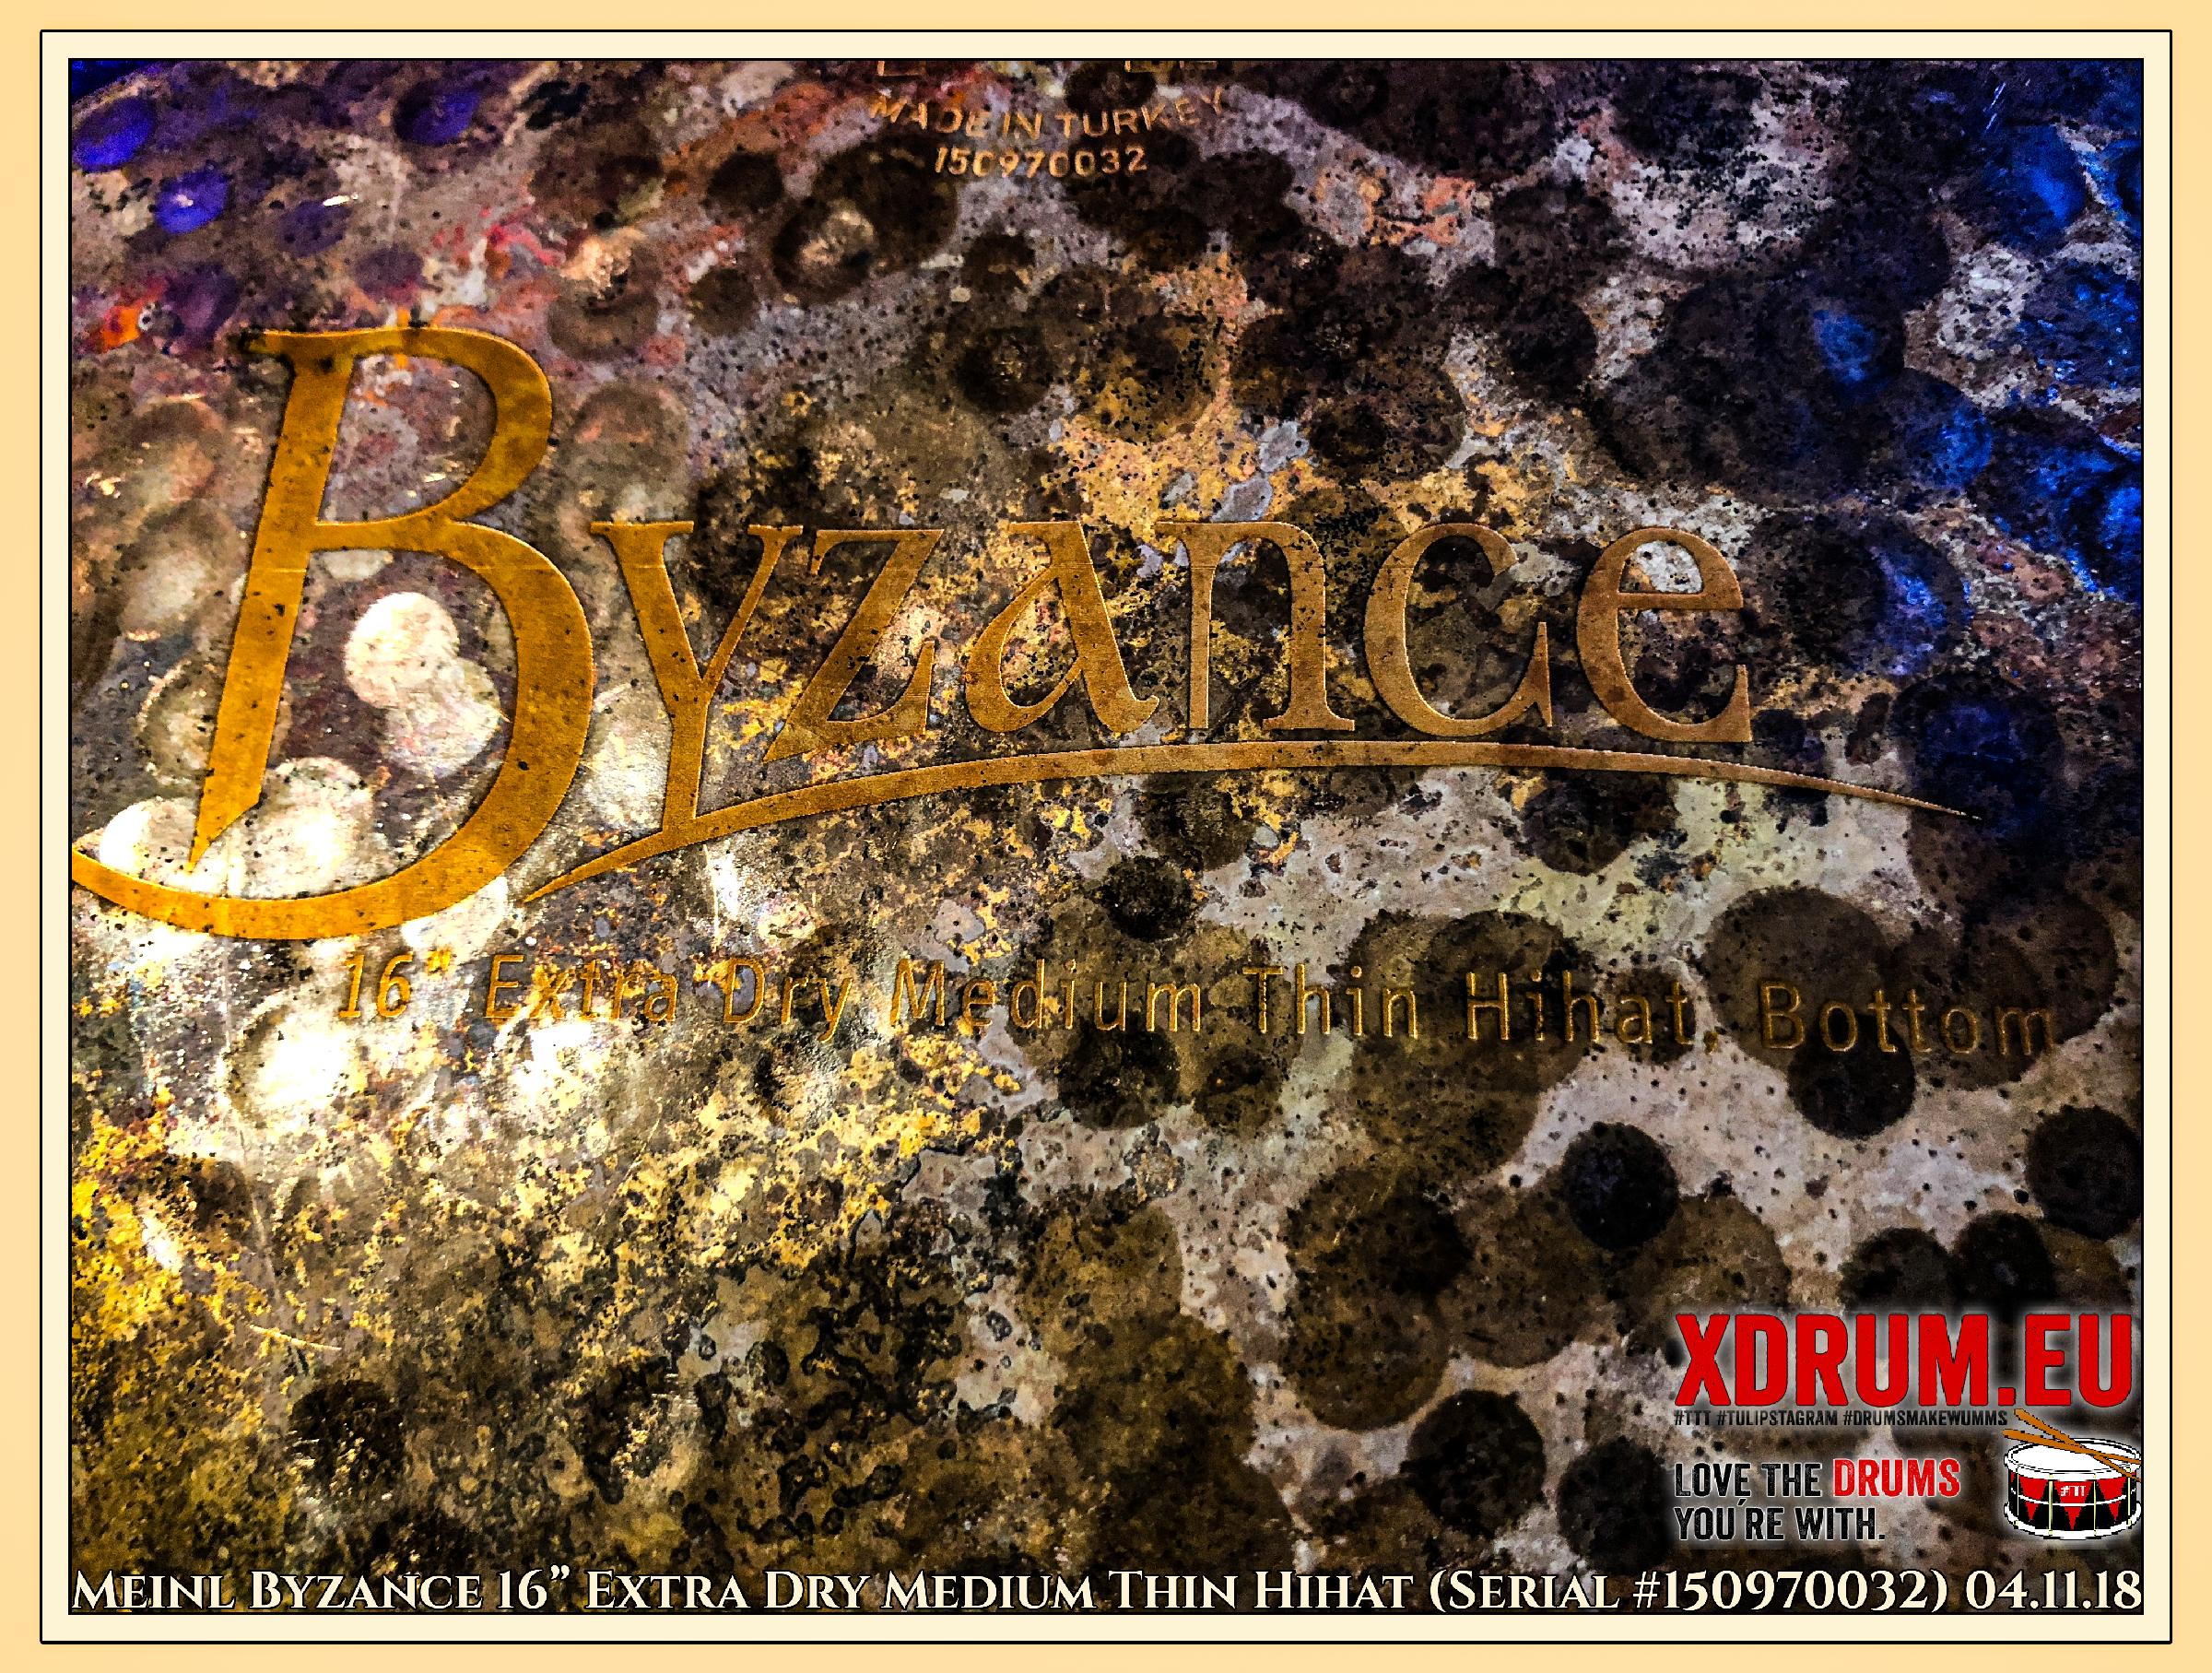 "Meinl Byzance 16"" Extra Dry Medium Thin Hihat (Serial #150970032) 04.11.18"